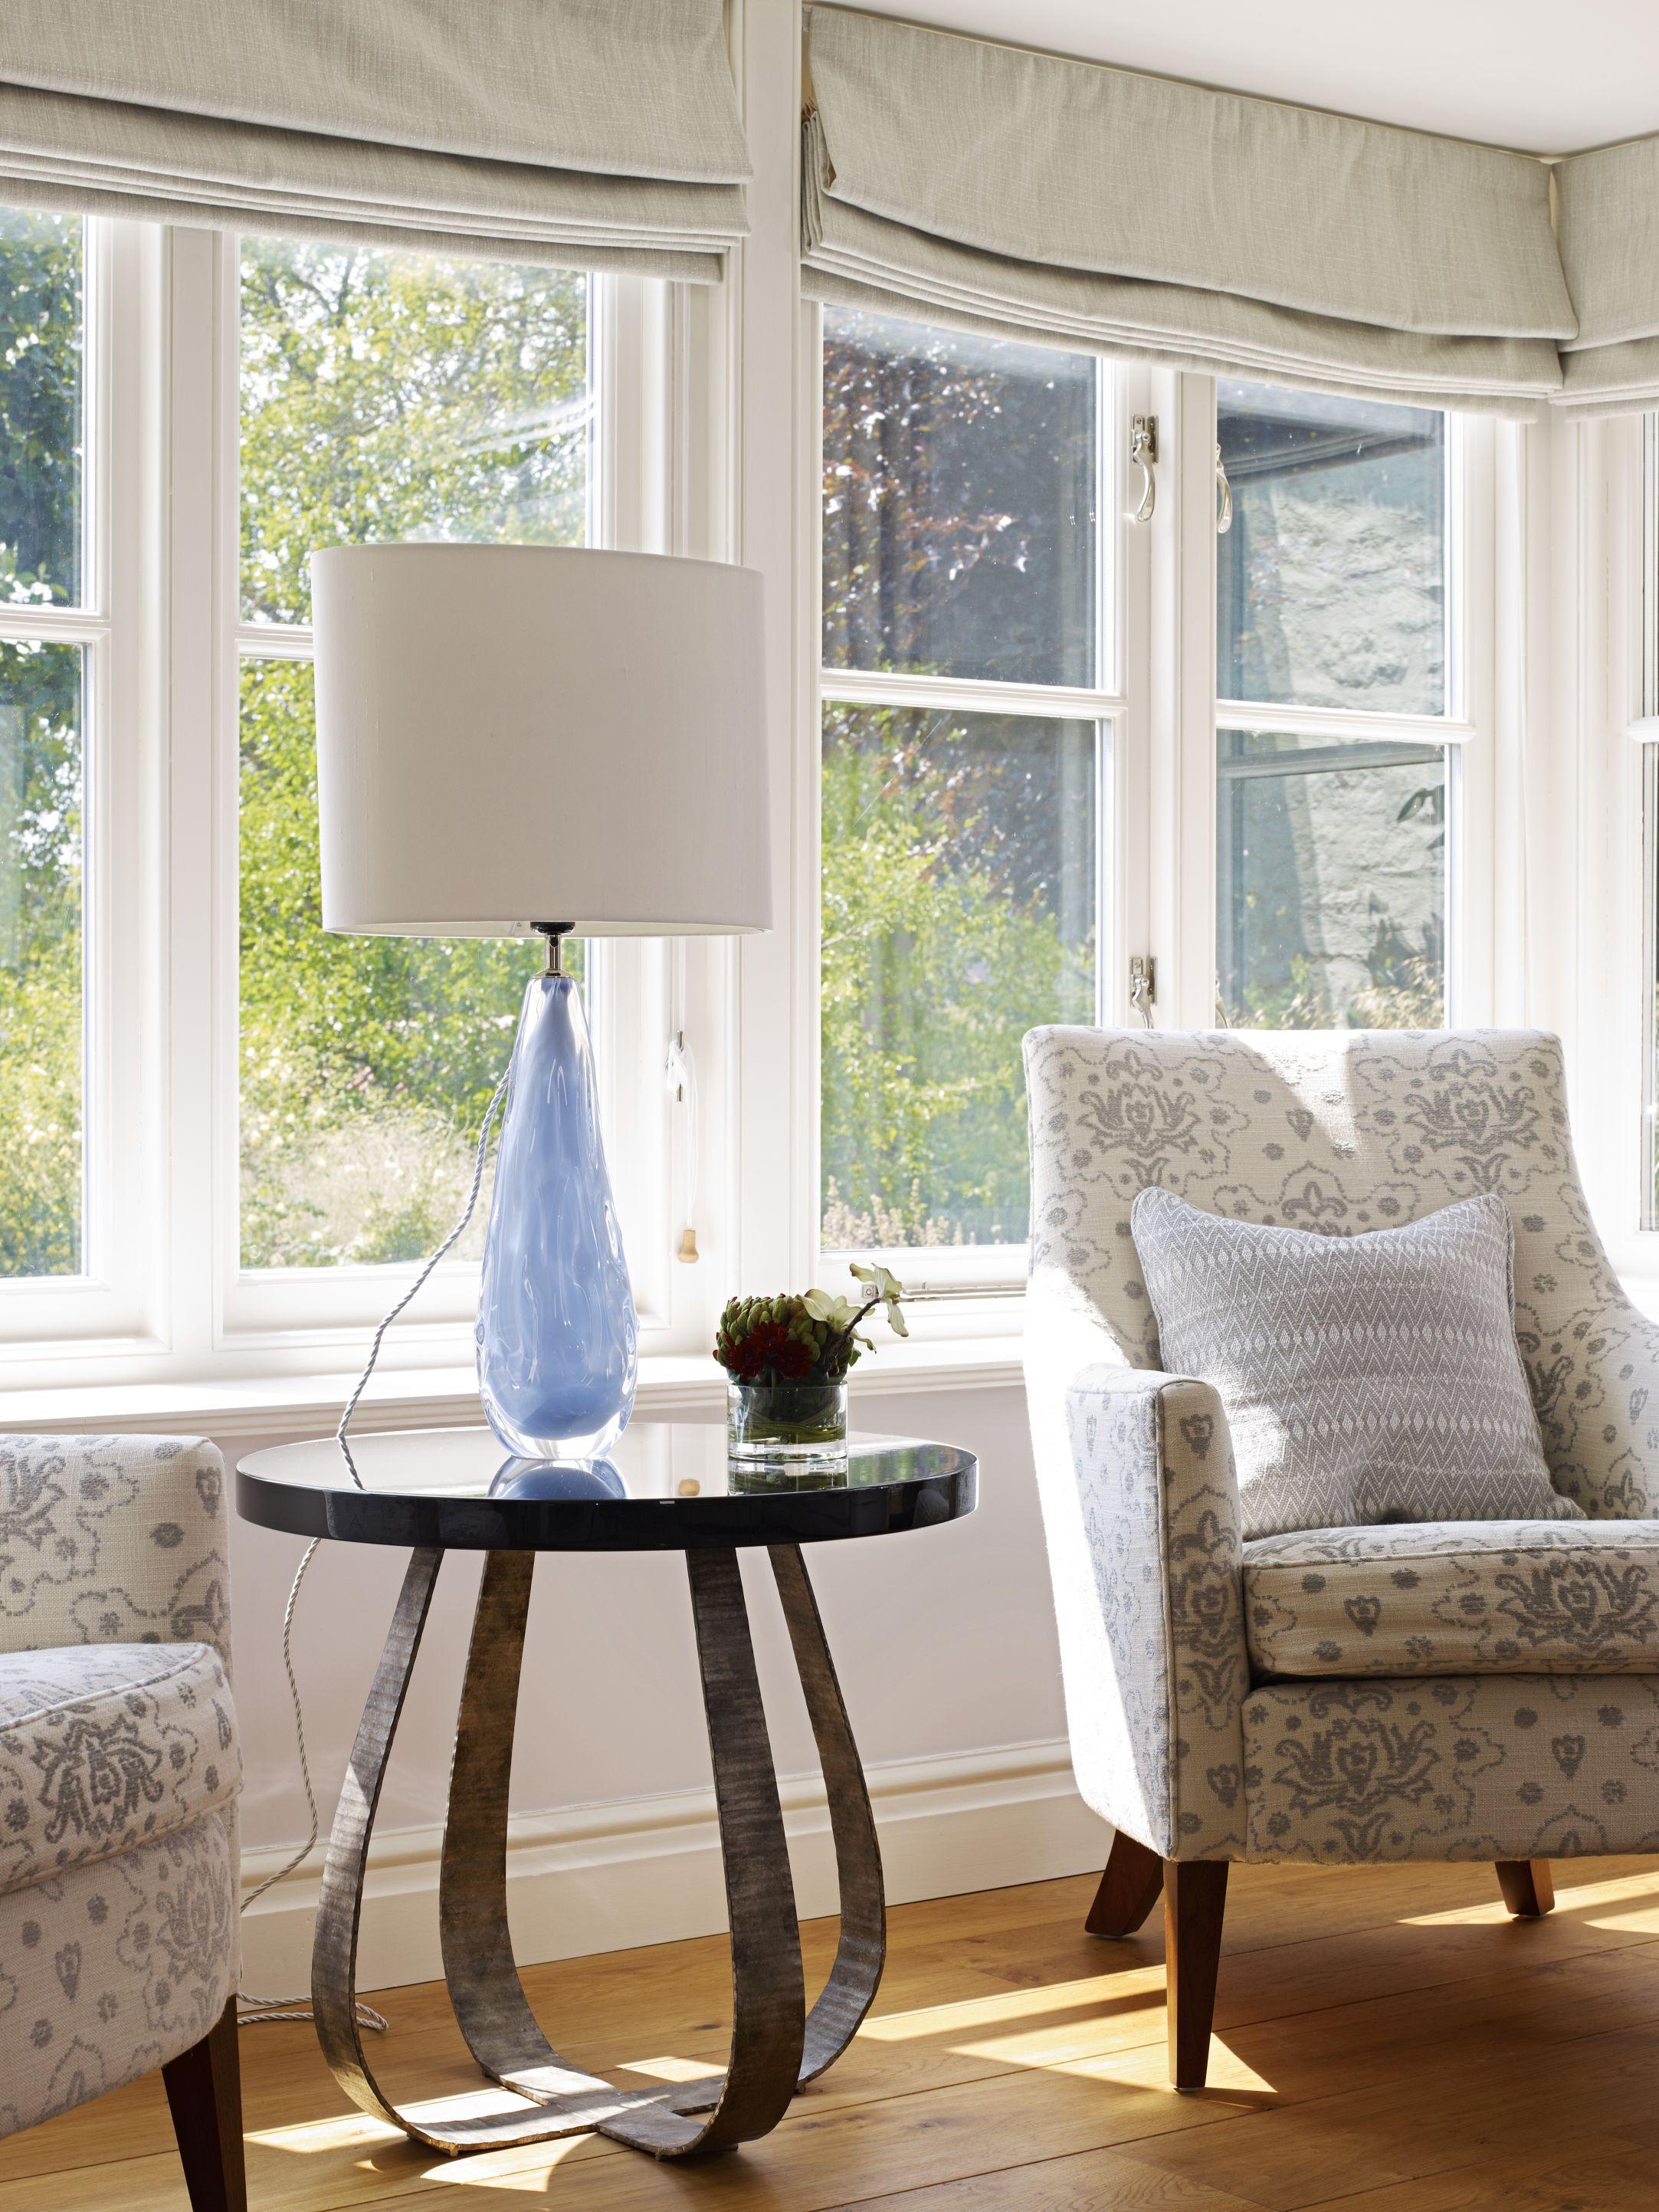 avacado lamp fig side table by porta romana interior design by